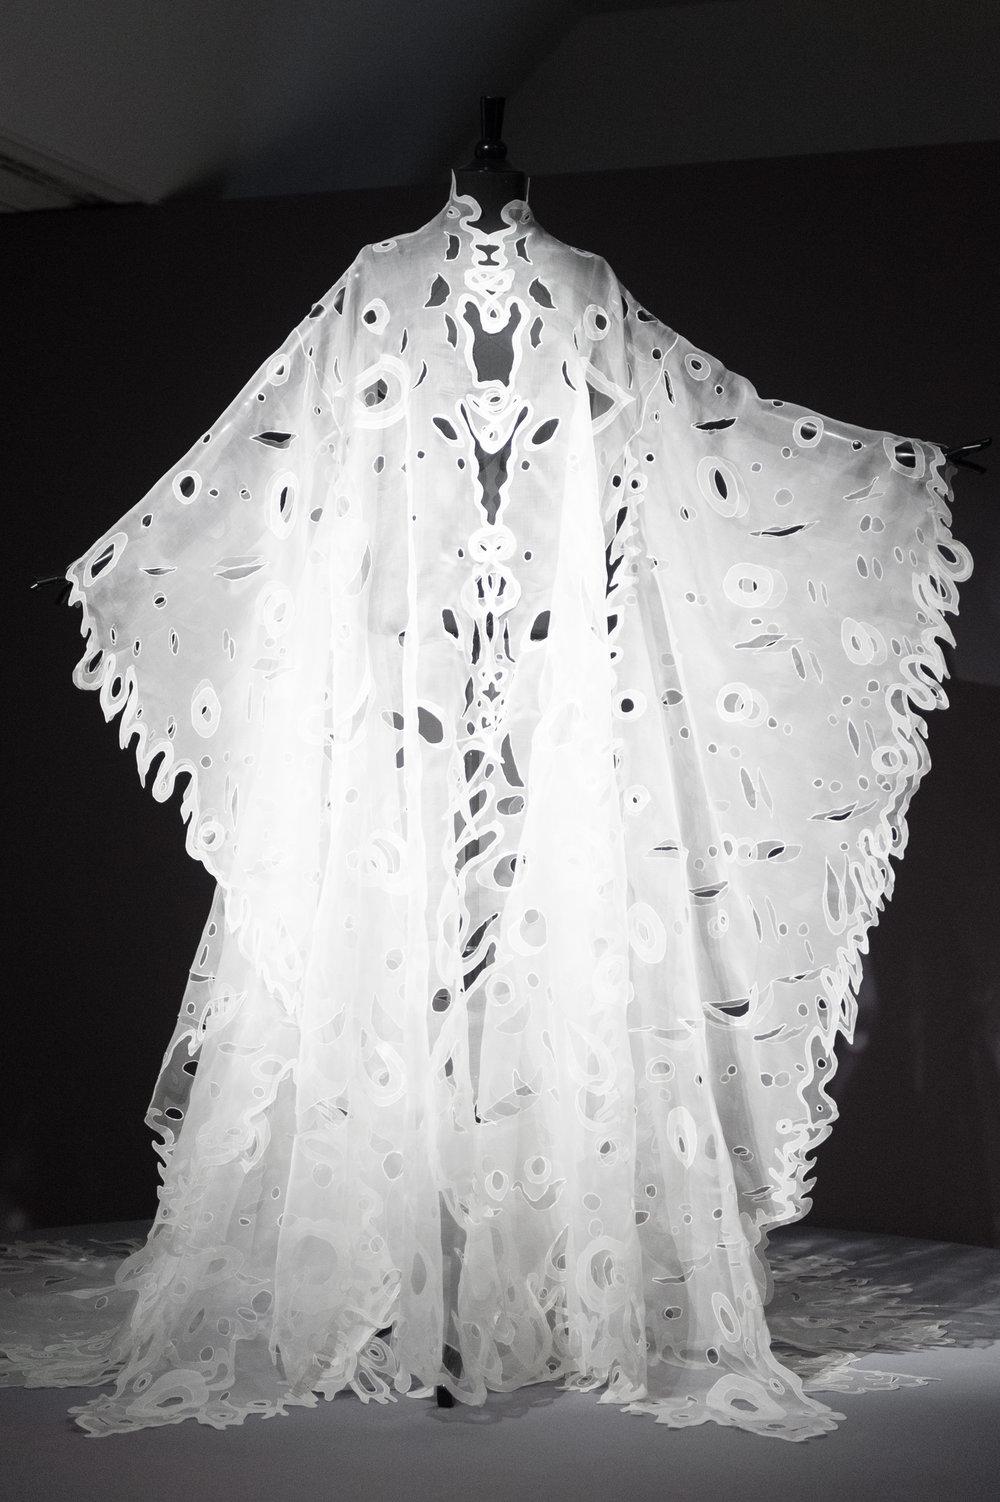 A stunning white kimono by Franck Sorbier